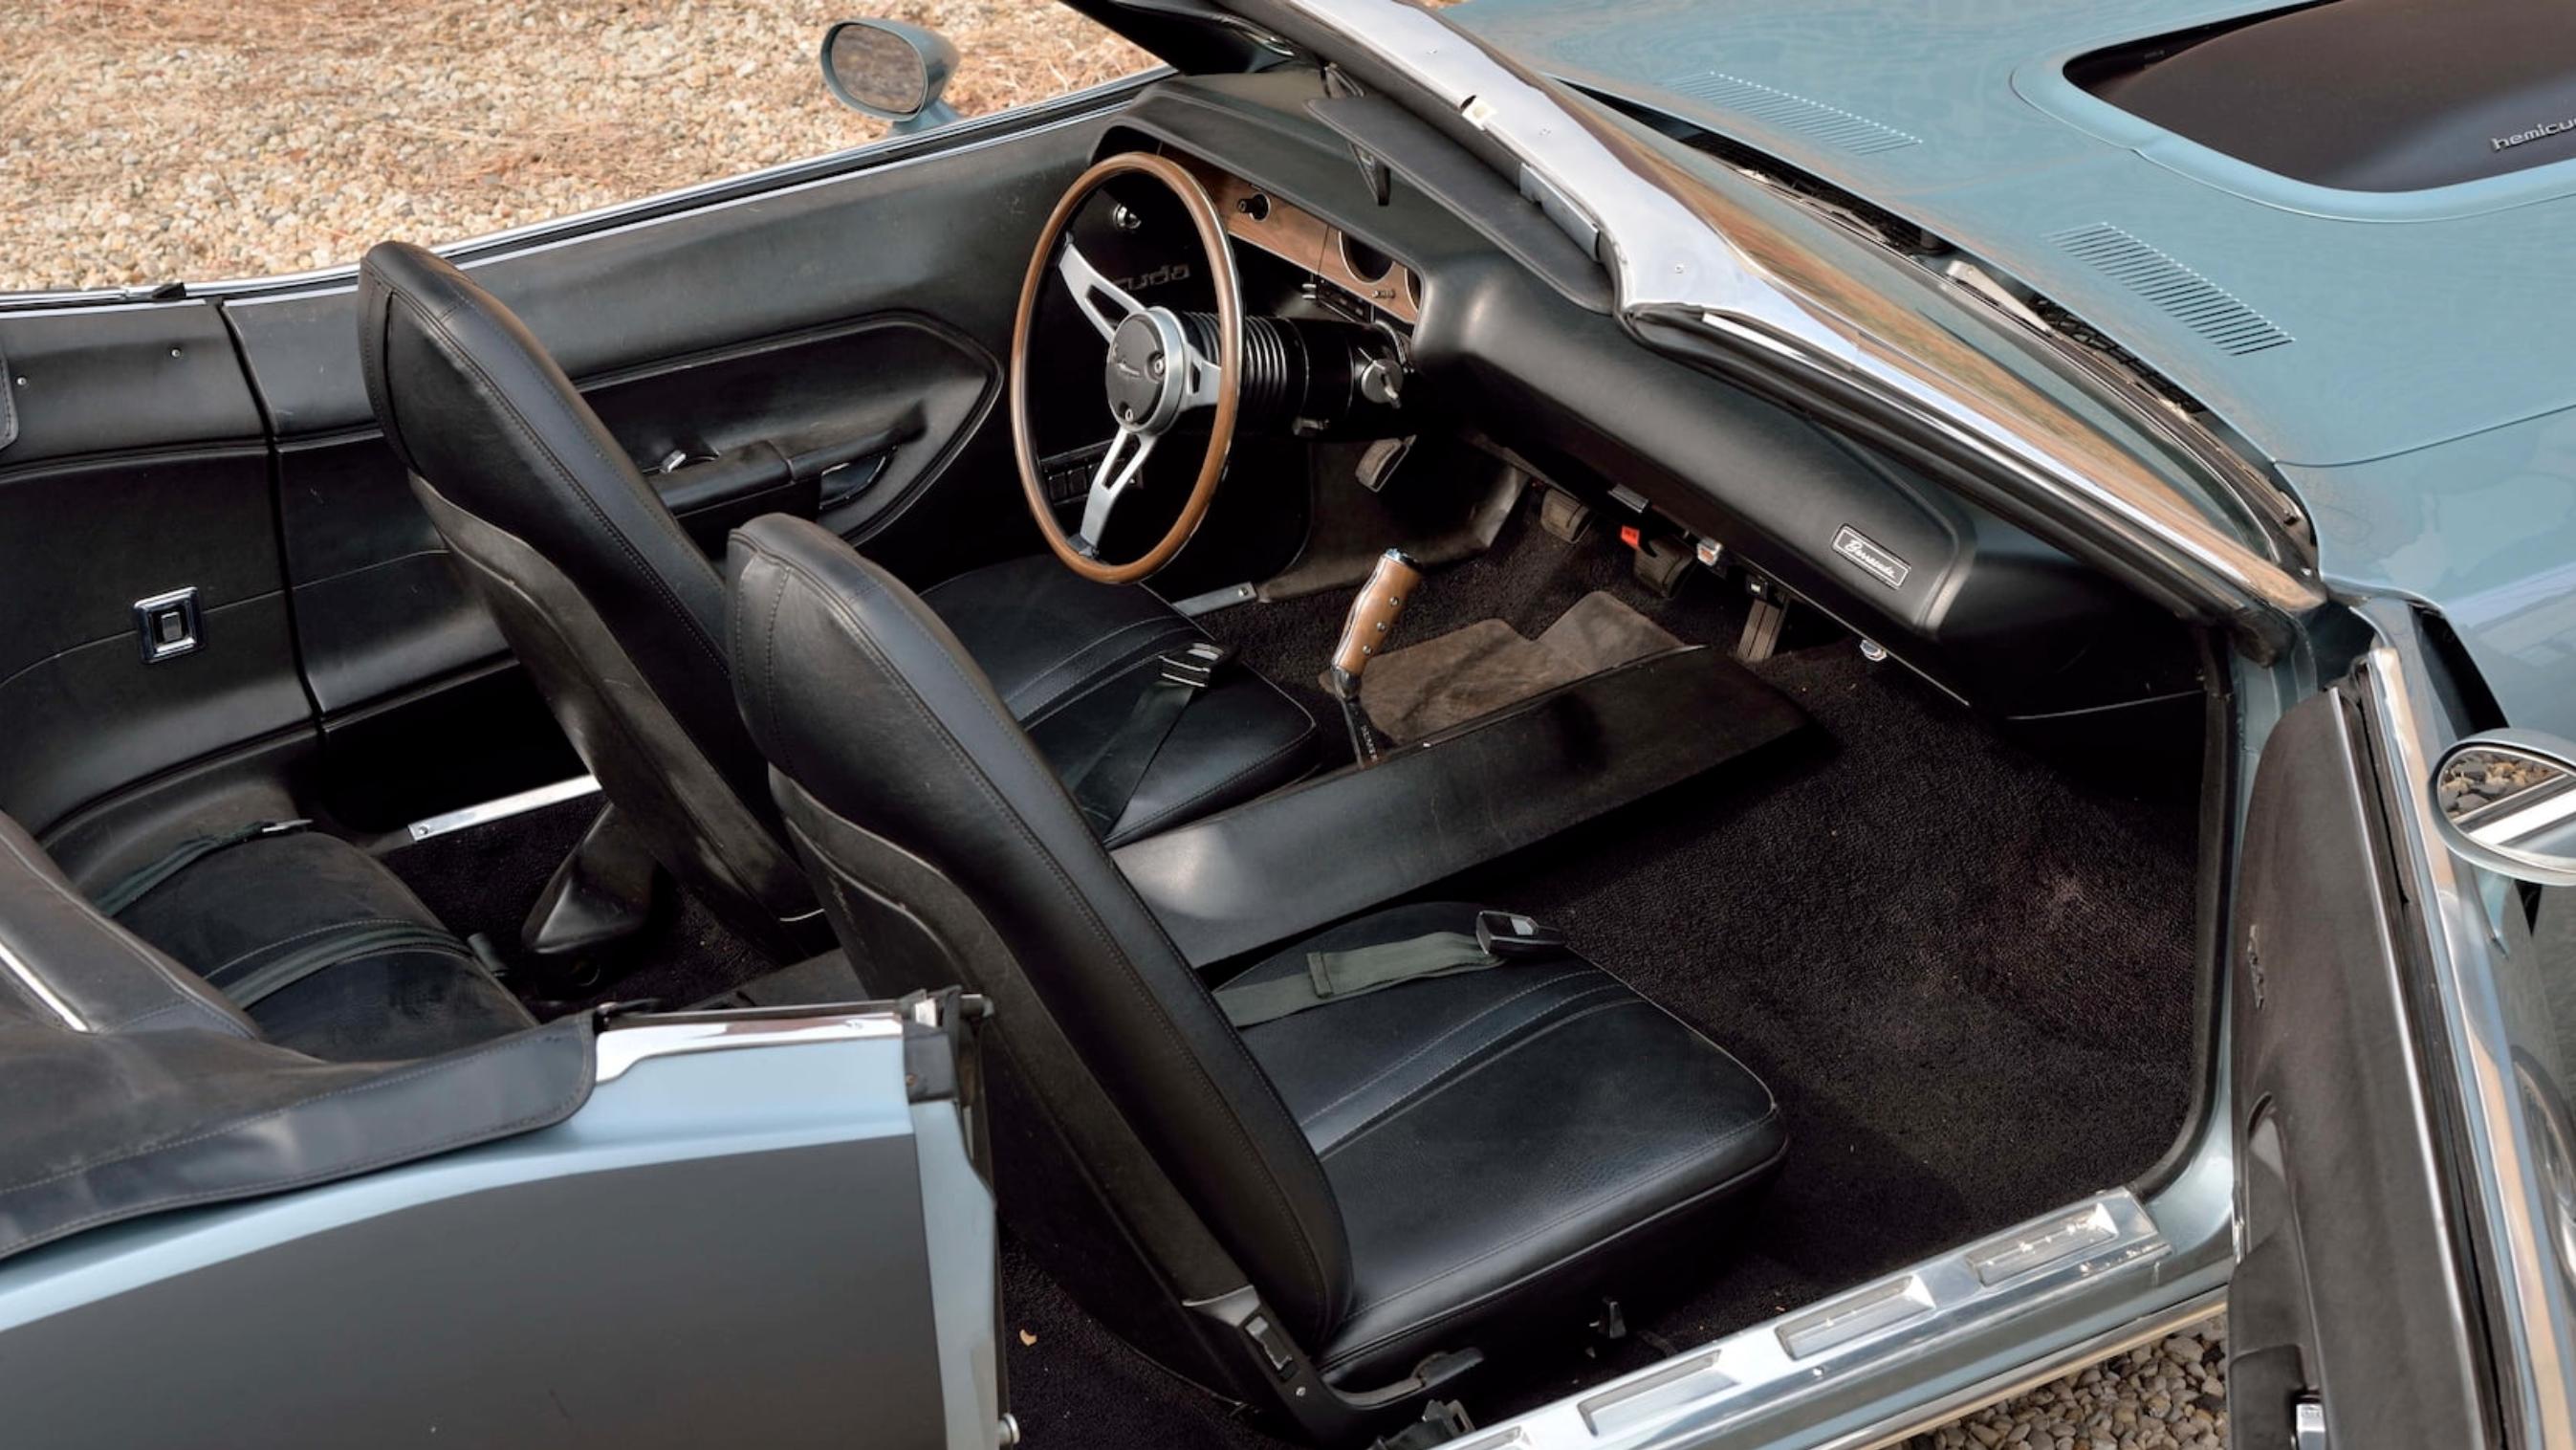 1971 Plymouth Hemi Cuda Convertible export interior